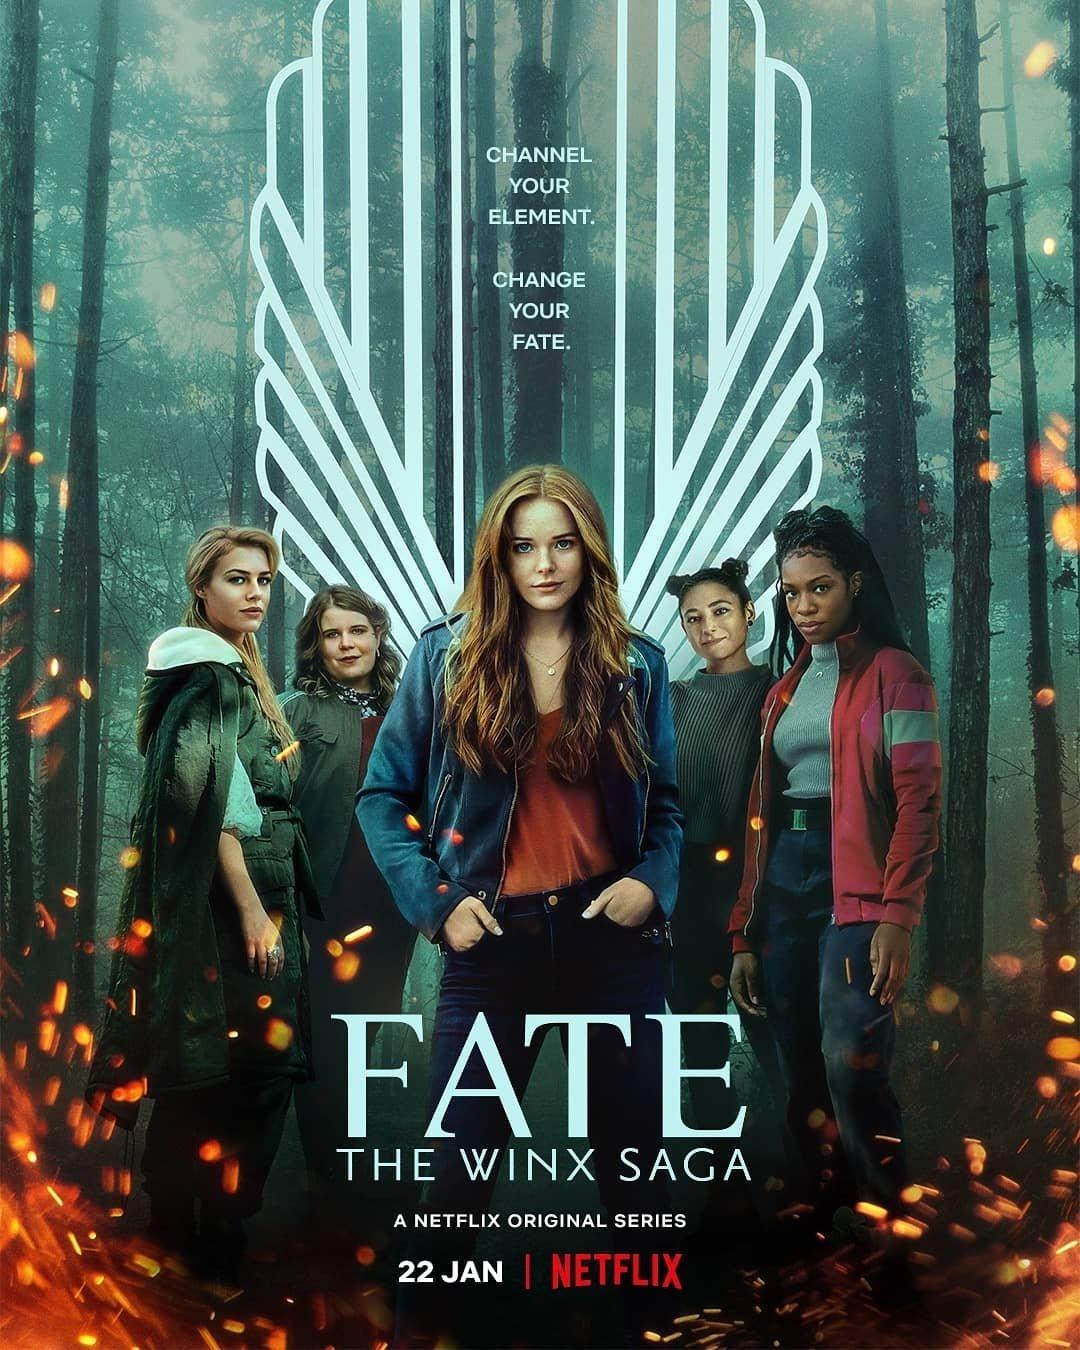 Download Fate The Winx Saga 2021 S01 Hindi Complete Netflix Web Series 720p HDRip 2GB